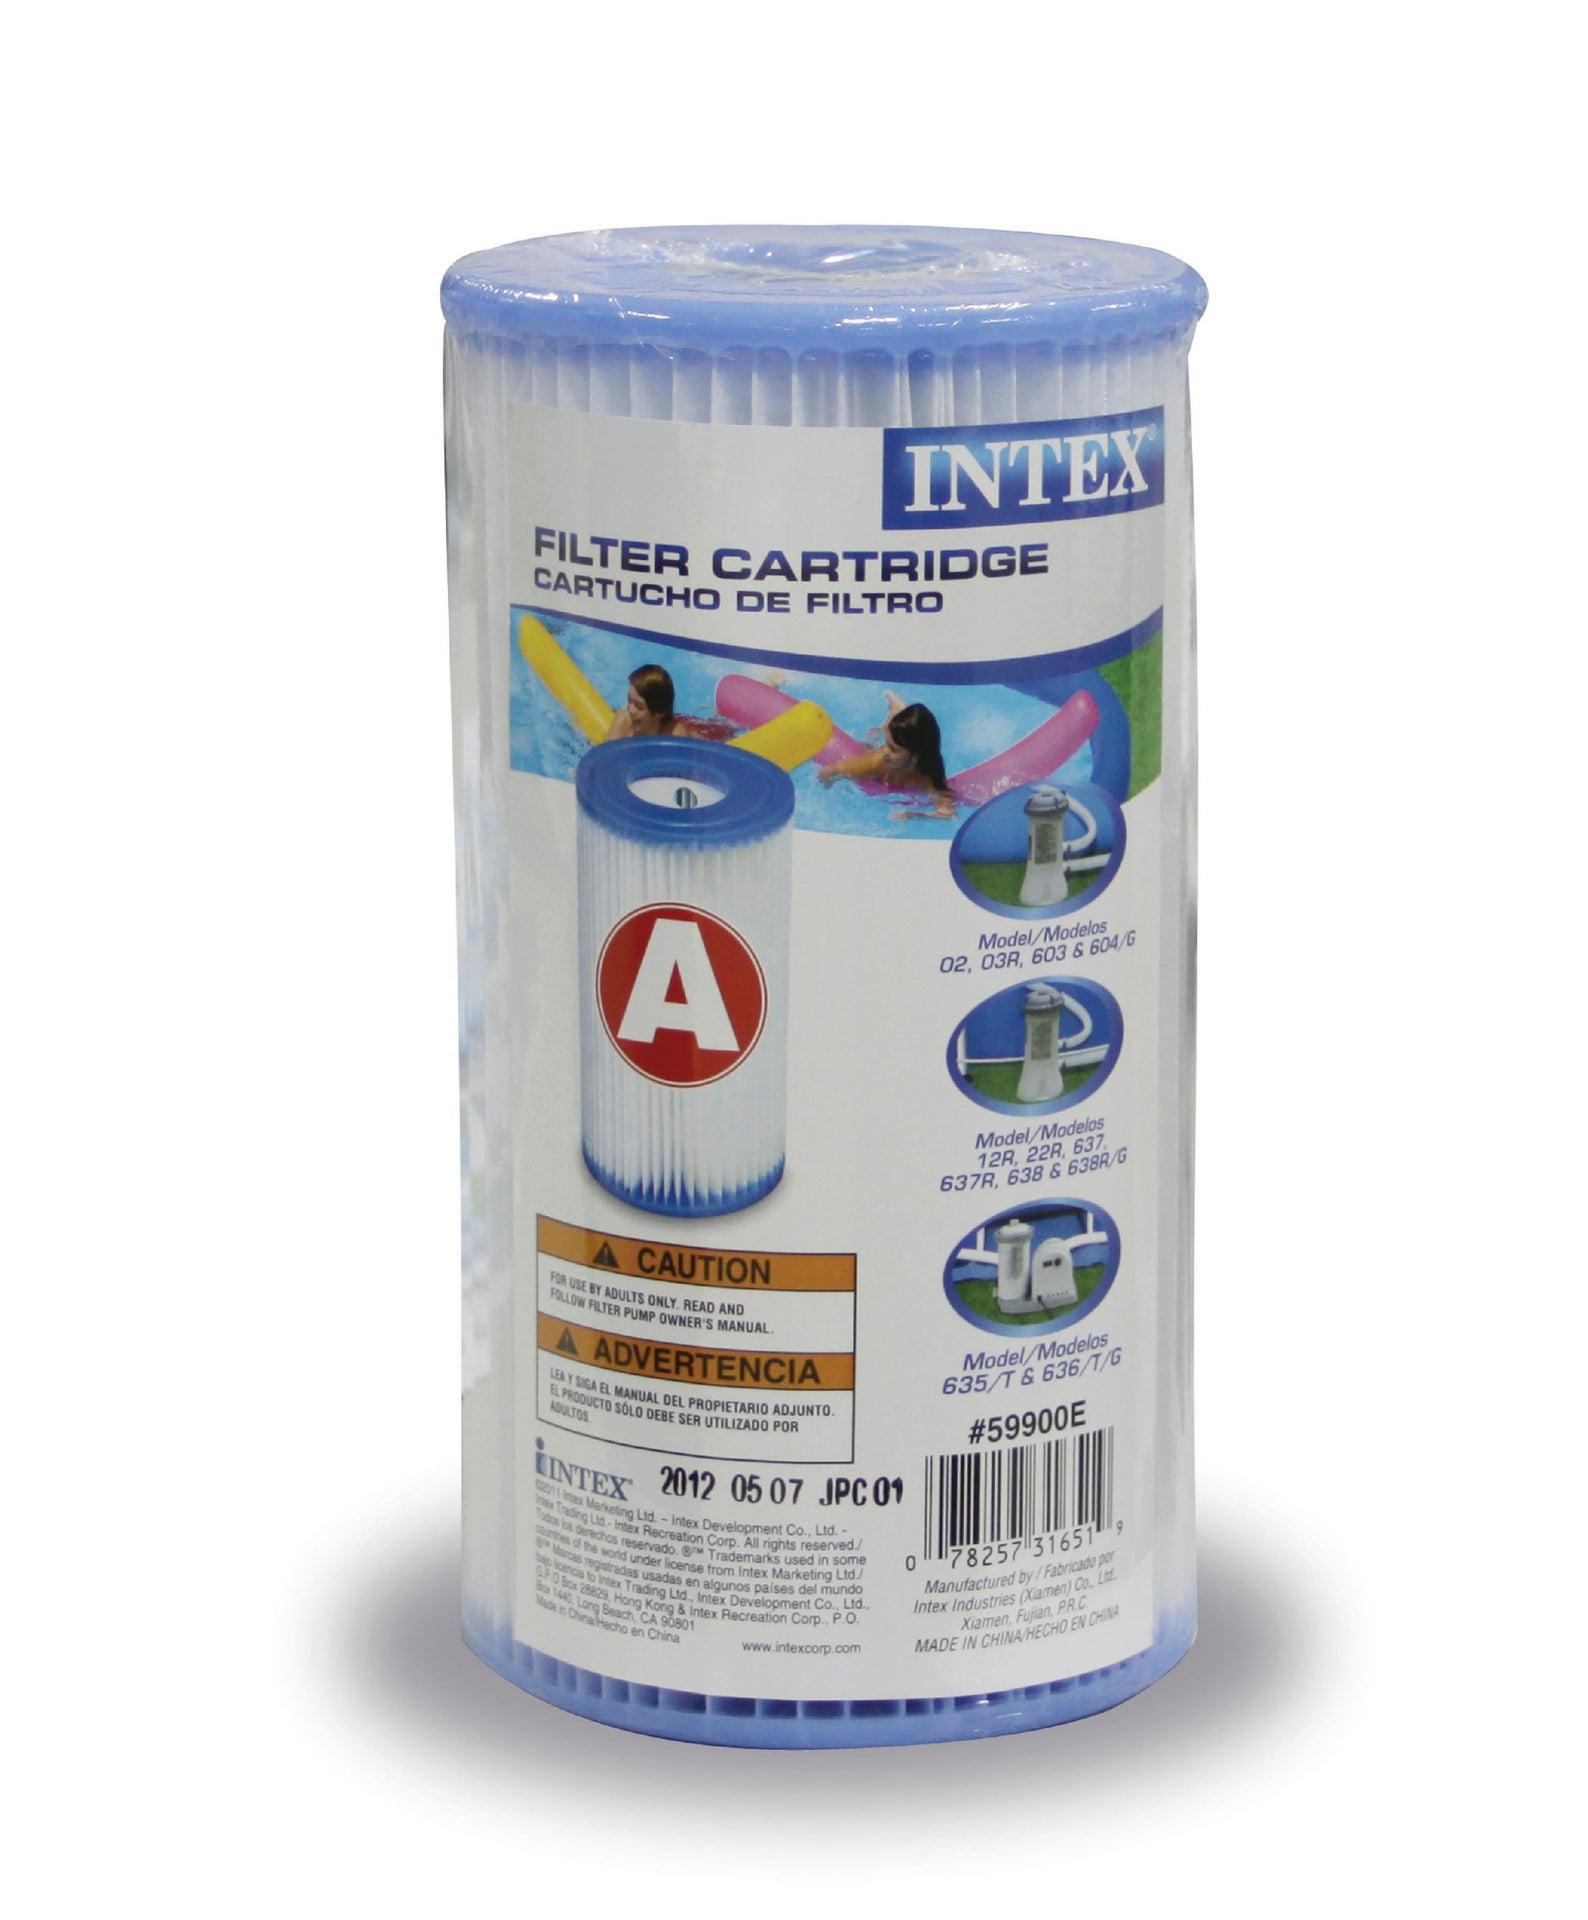 Cartouche Filtrante A Intex avec Cartouche Filtre Piscine Intex